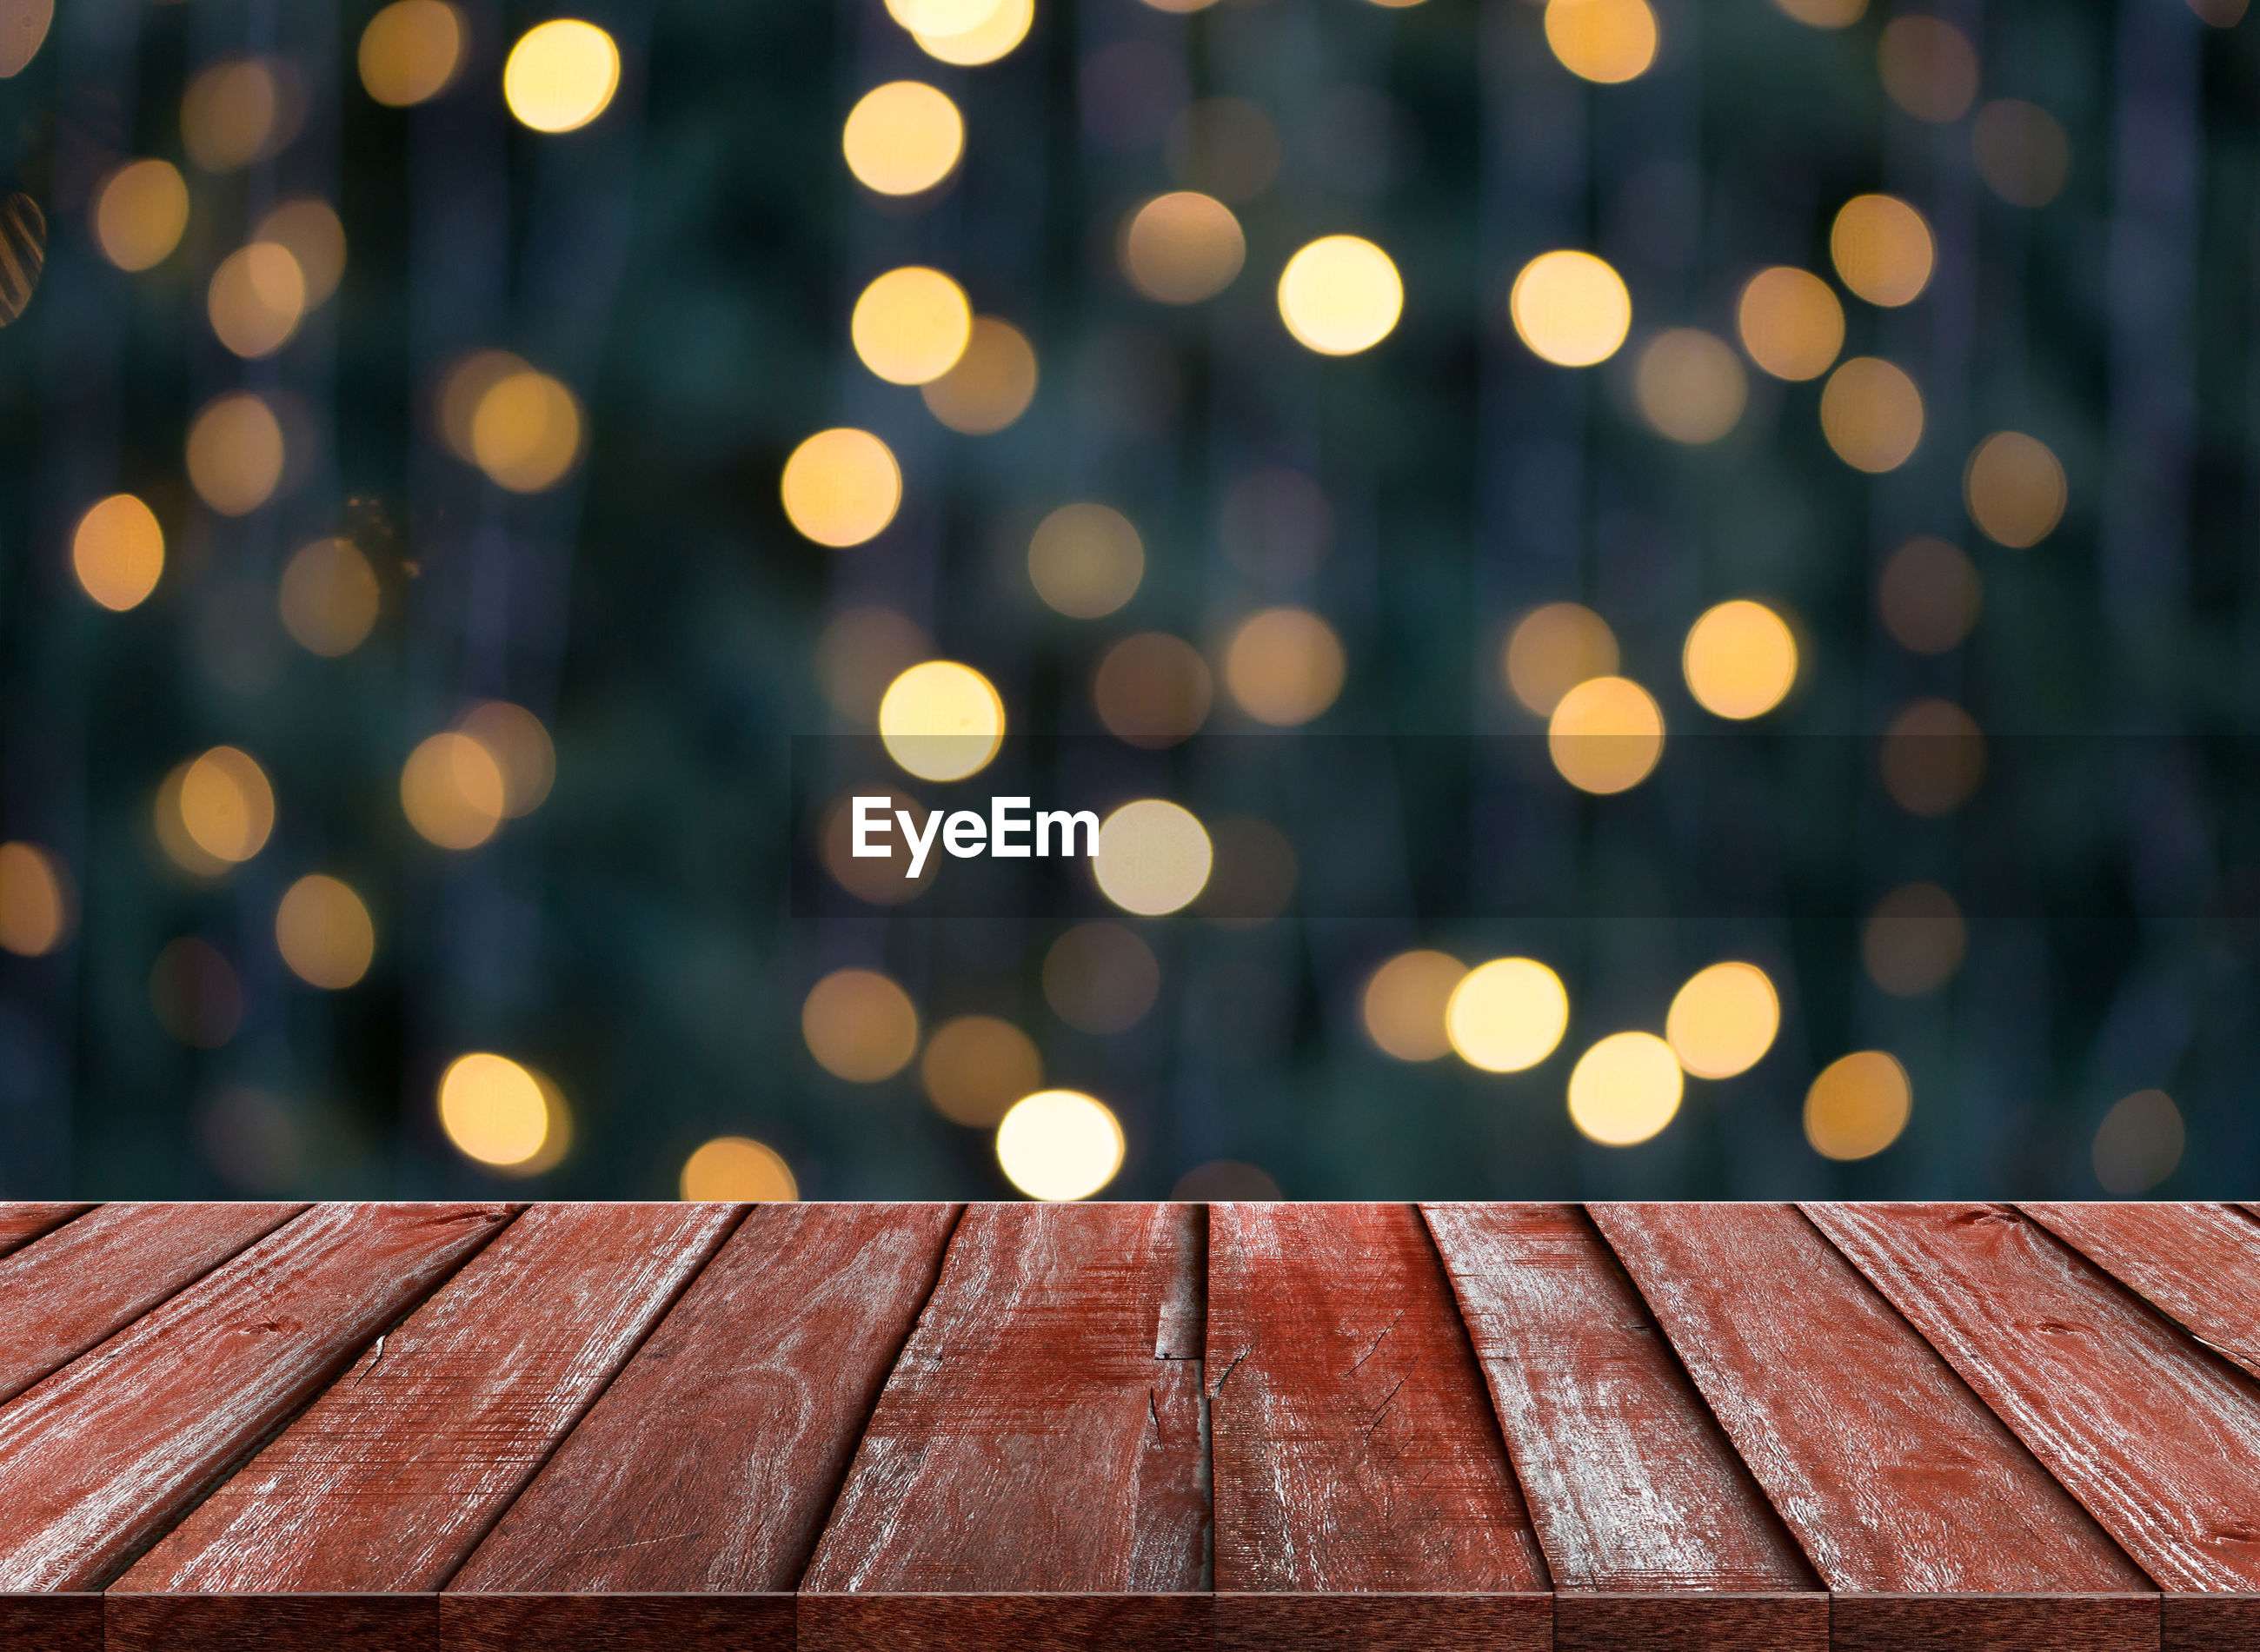 Wooden table against illuminated lights